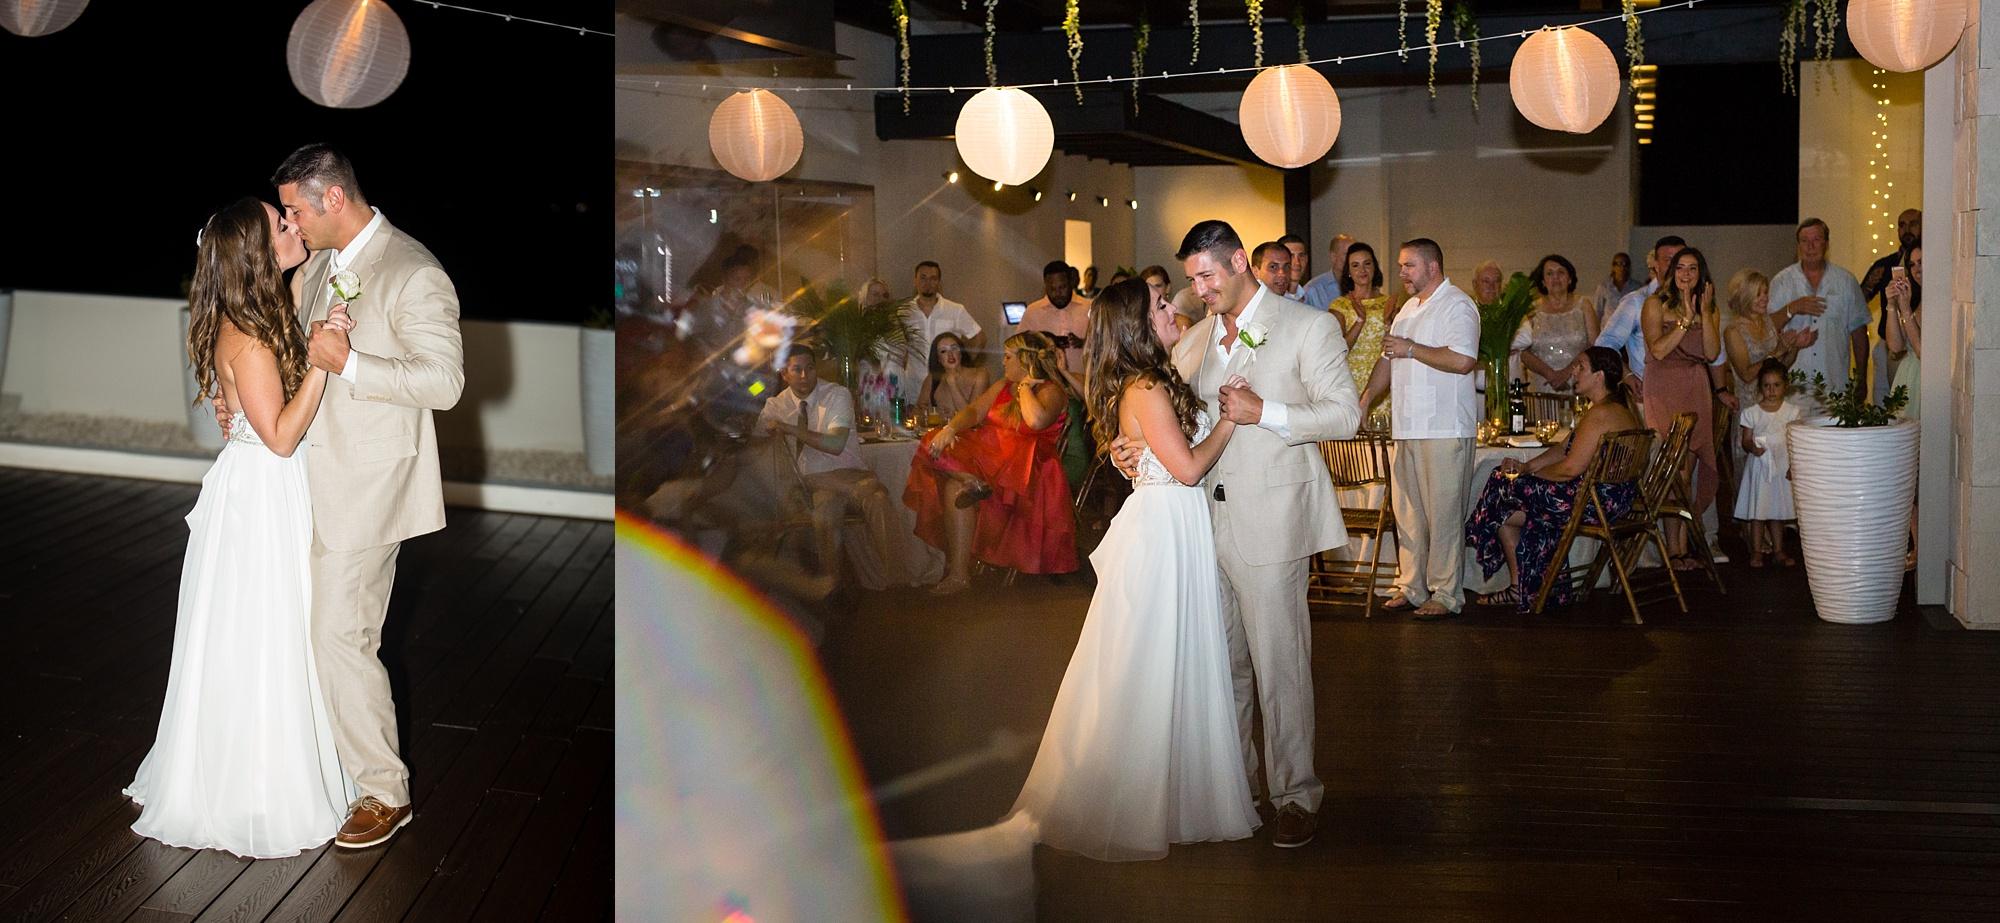 Brandon_Shafer_Photography_Scott_Marisa_Negril_Jamaica_Destination_Wedding_Photography_0062.jpg